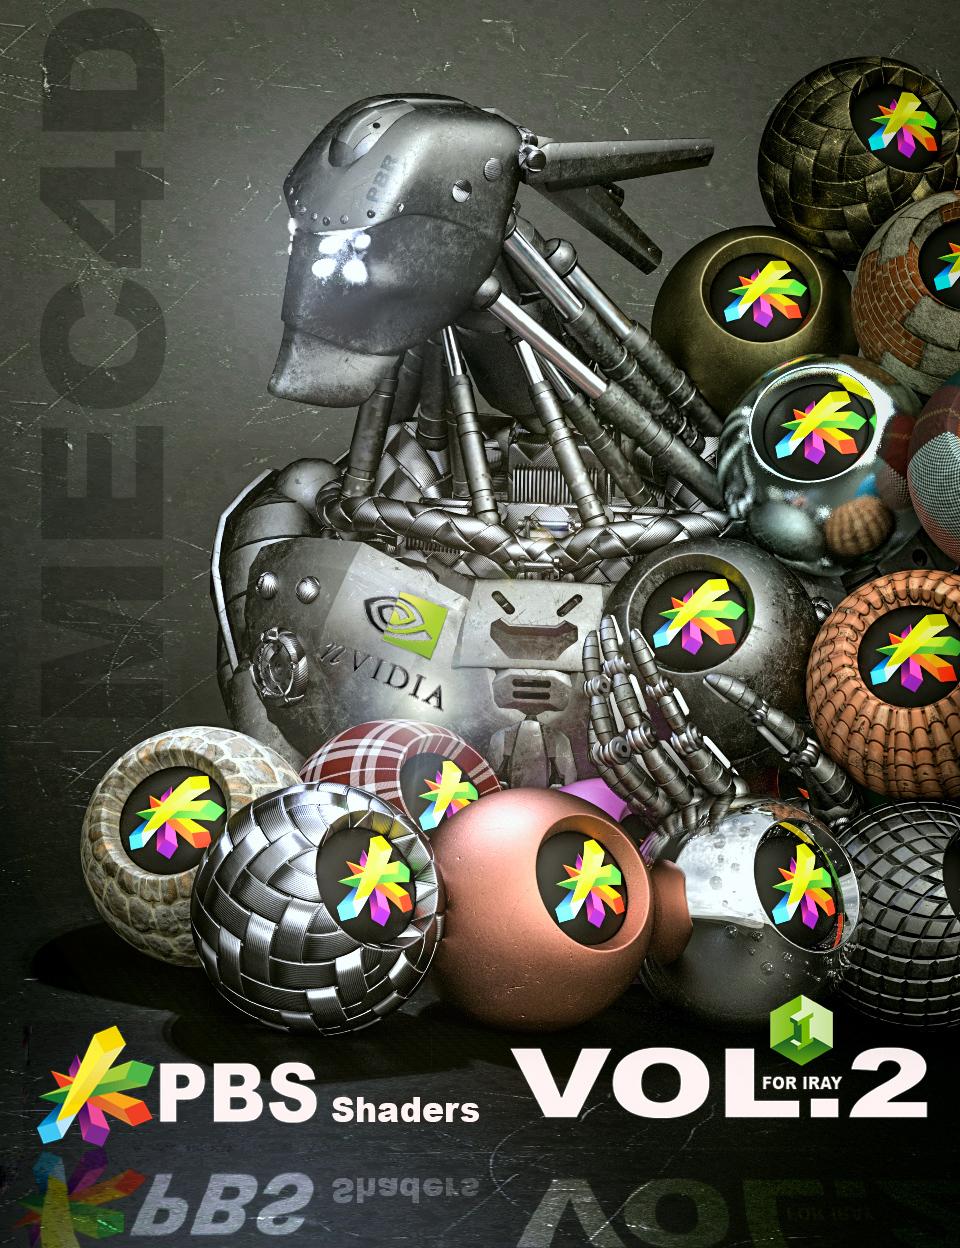 Mec4d PBS Shaders vol.2 for Iray by: Mec4D, 3D Models by Daz 3D